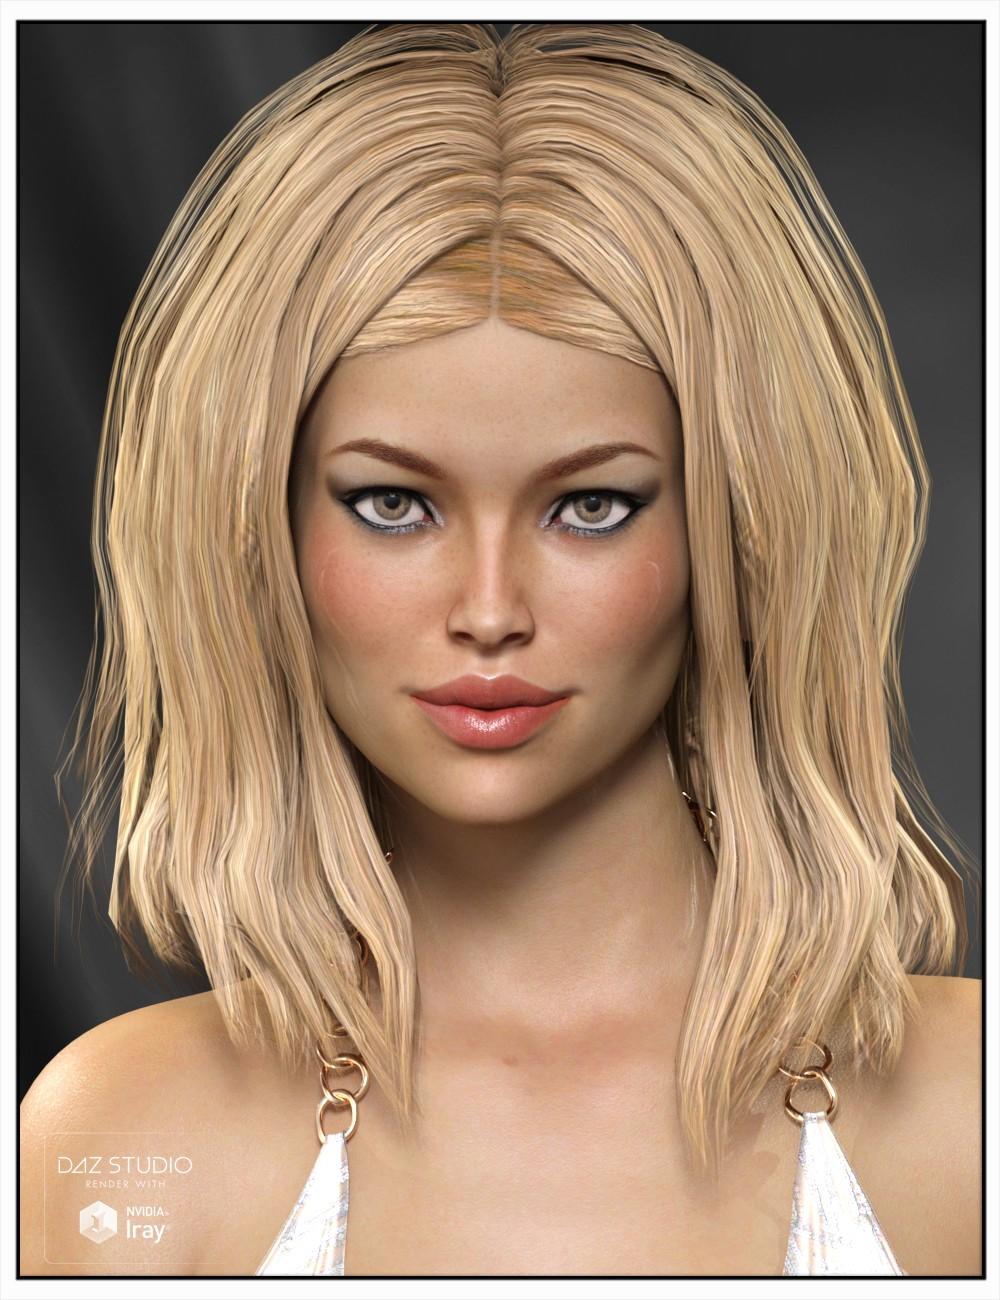 Hair daz3d 4